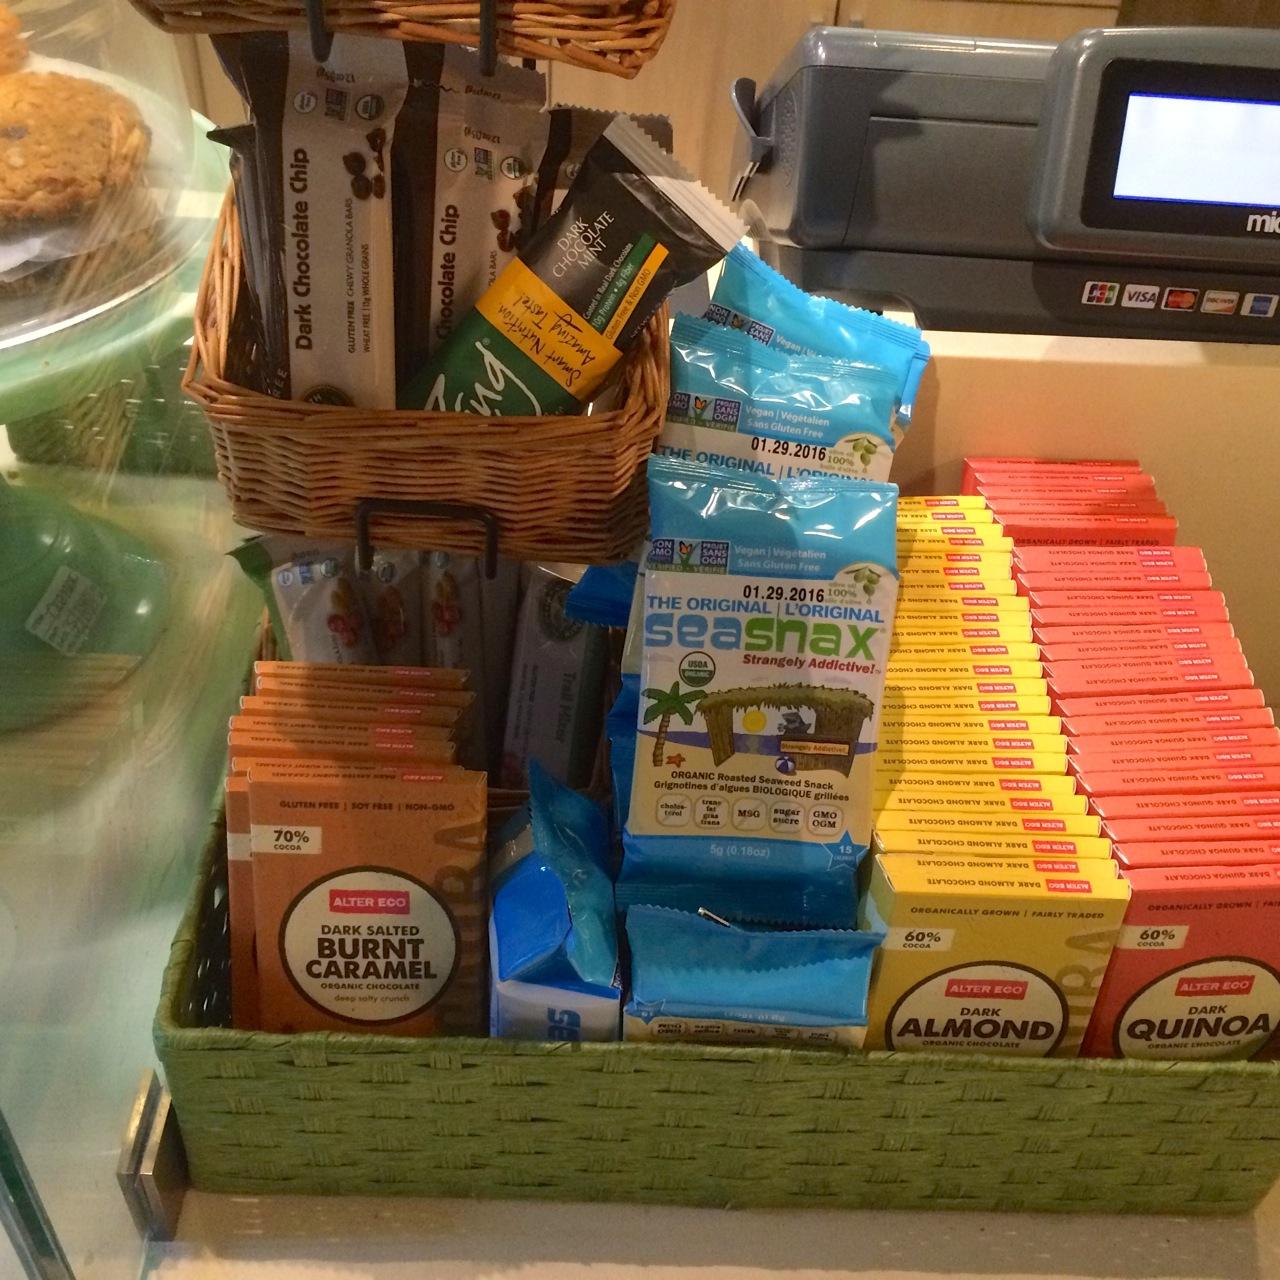 http://i0.wp.com/fatgayvegan.com/wp-content/uploads/2015/06/vegan-and-non-vegan-snacks-at-real-food-daily-LAX.jpg?fit=1280%2C1280